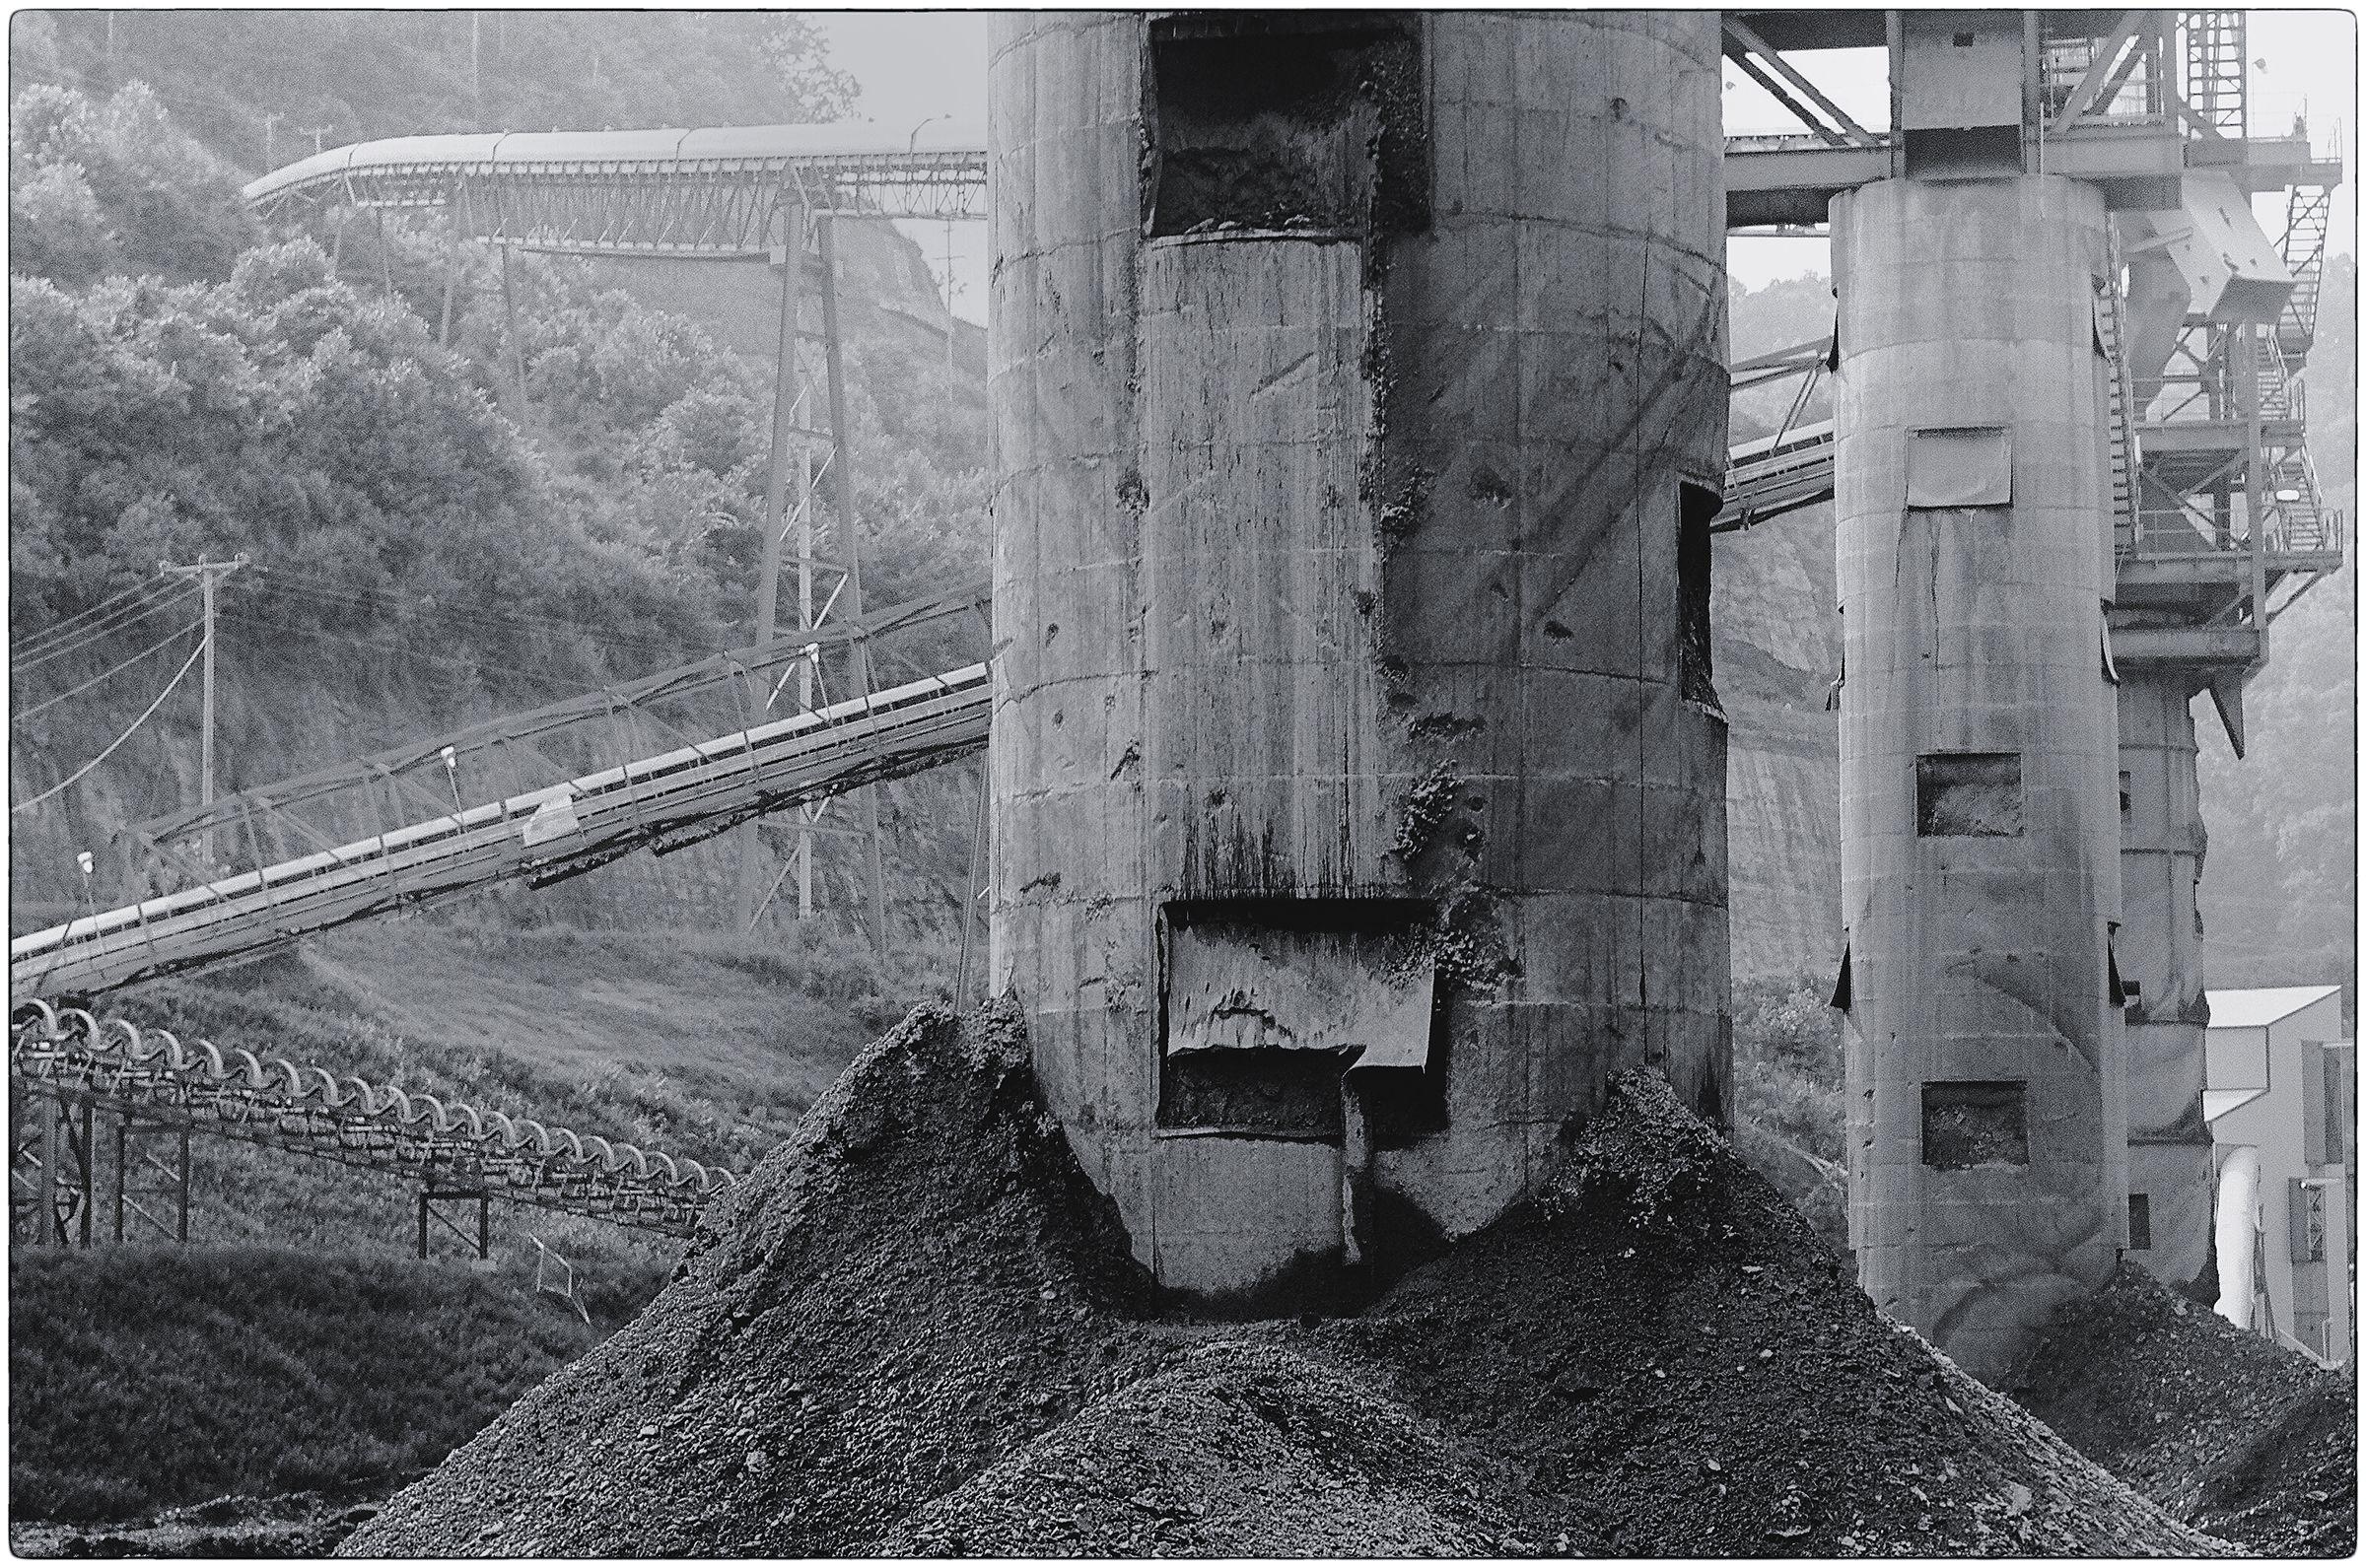 Coal mine west virginia maryland film photographer